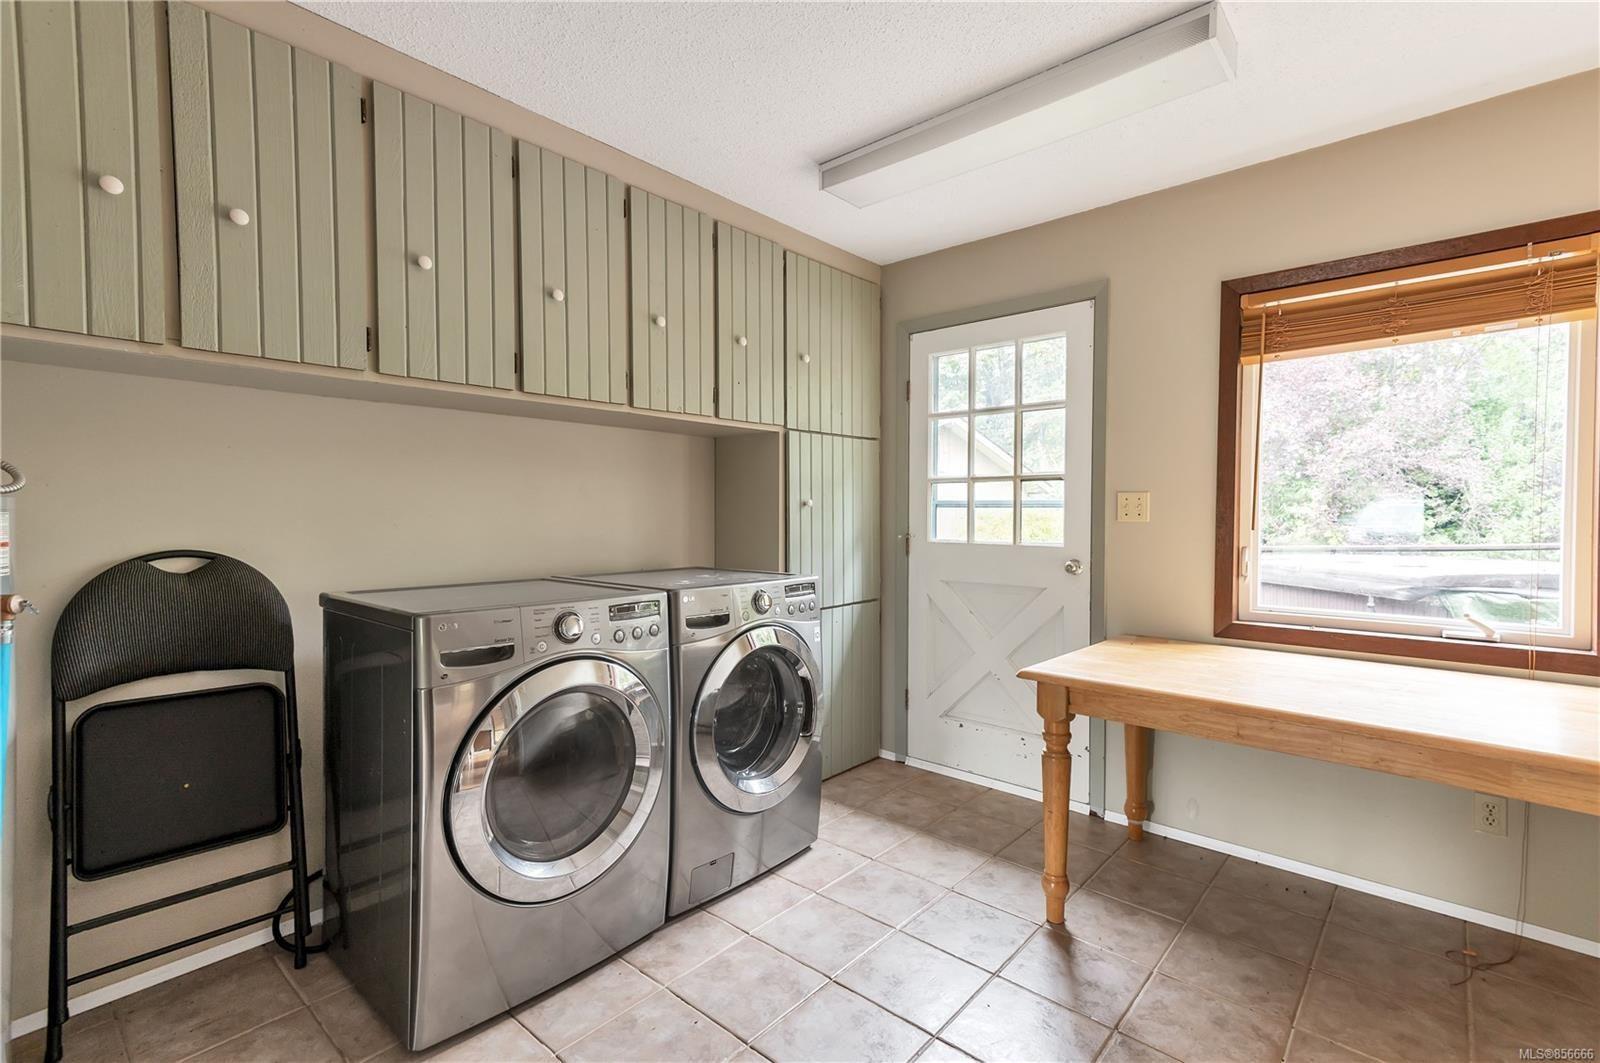 Photo 25: Photos: 2468 Oakes Rd in : CV Merville Black Creek House for sale (Comox Valley)  : MLS®# 856666